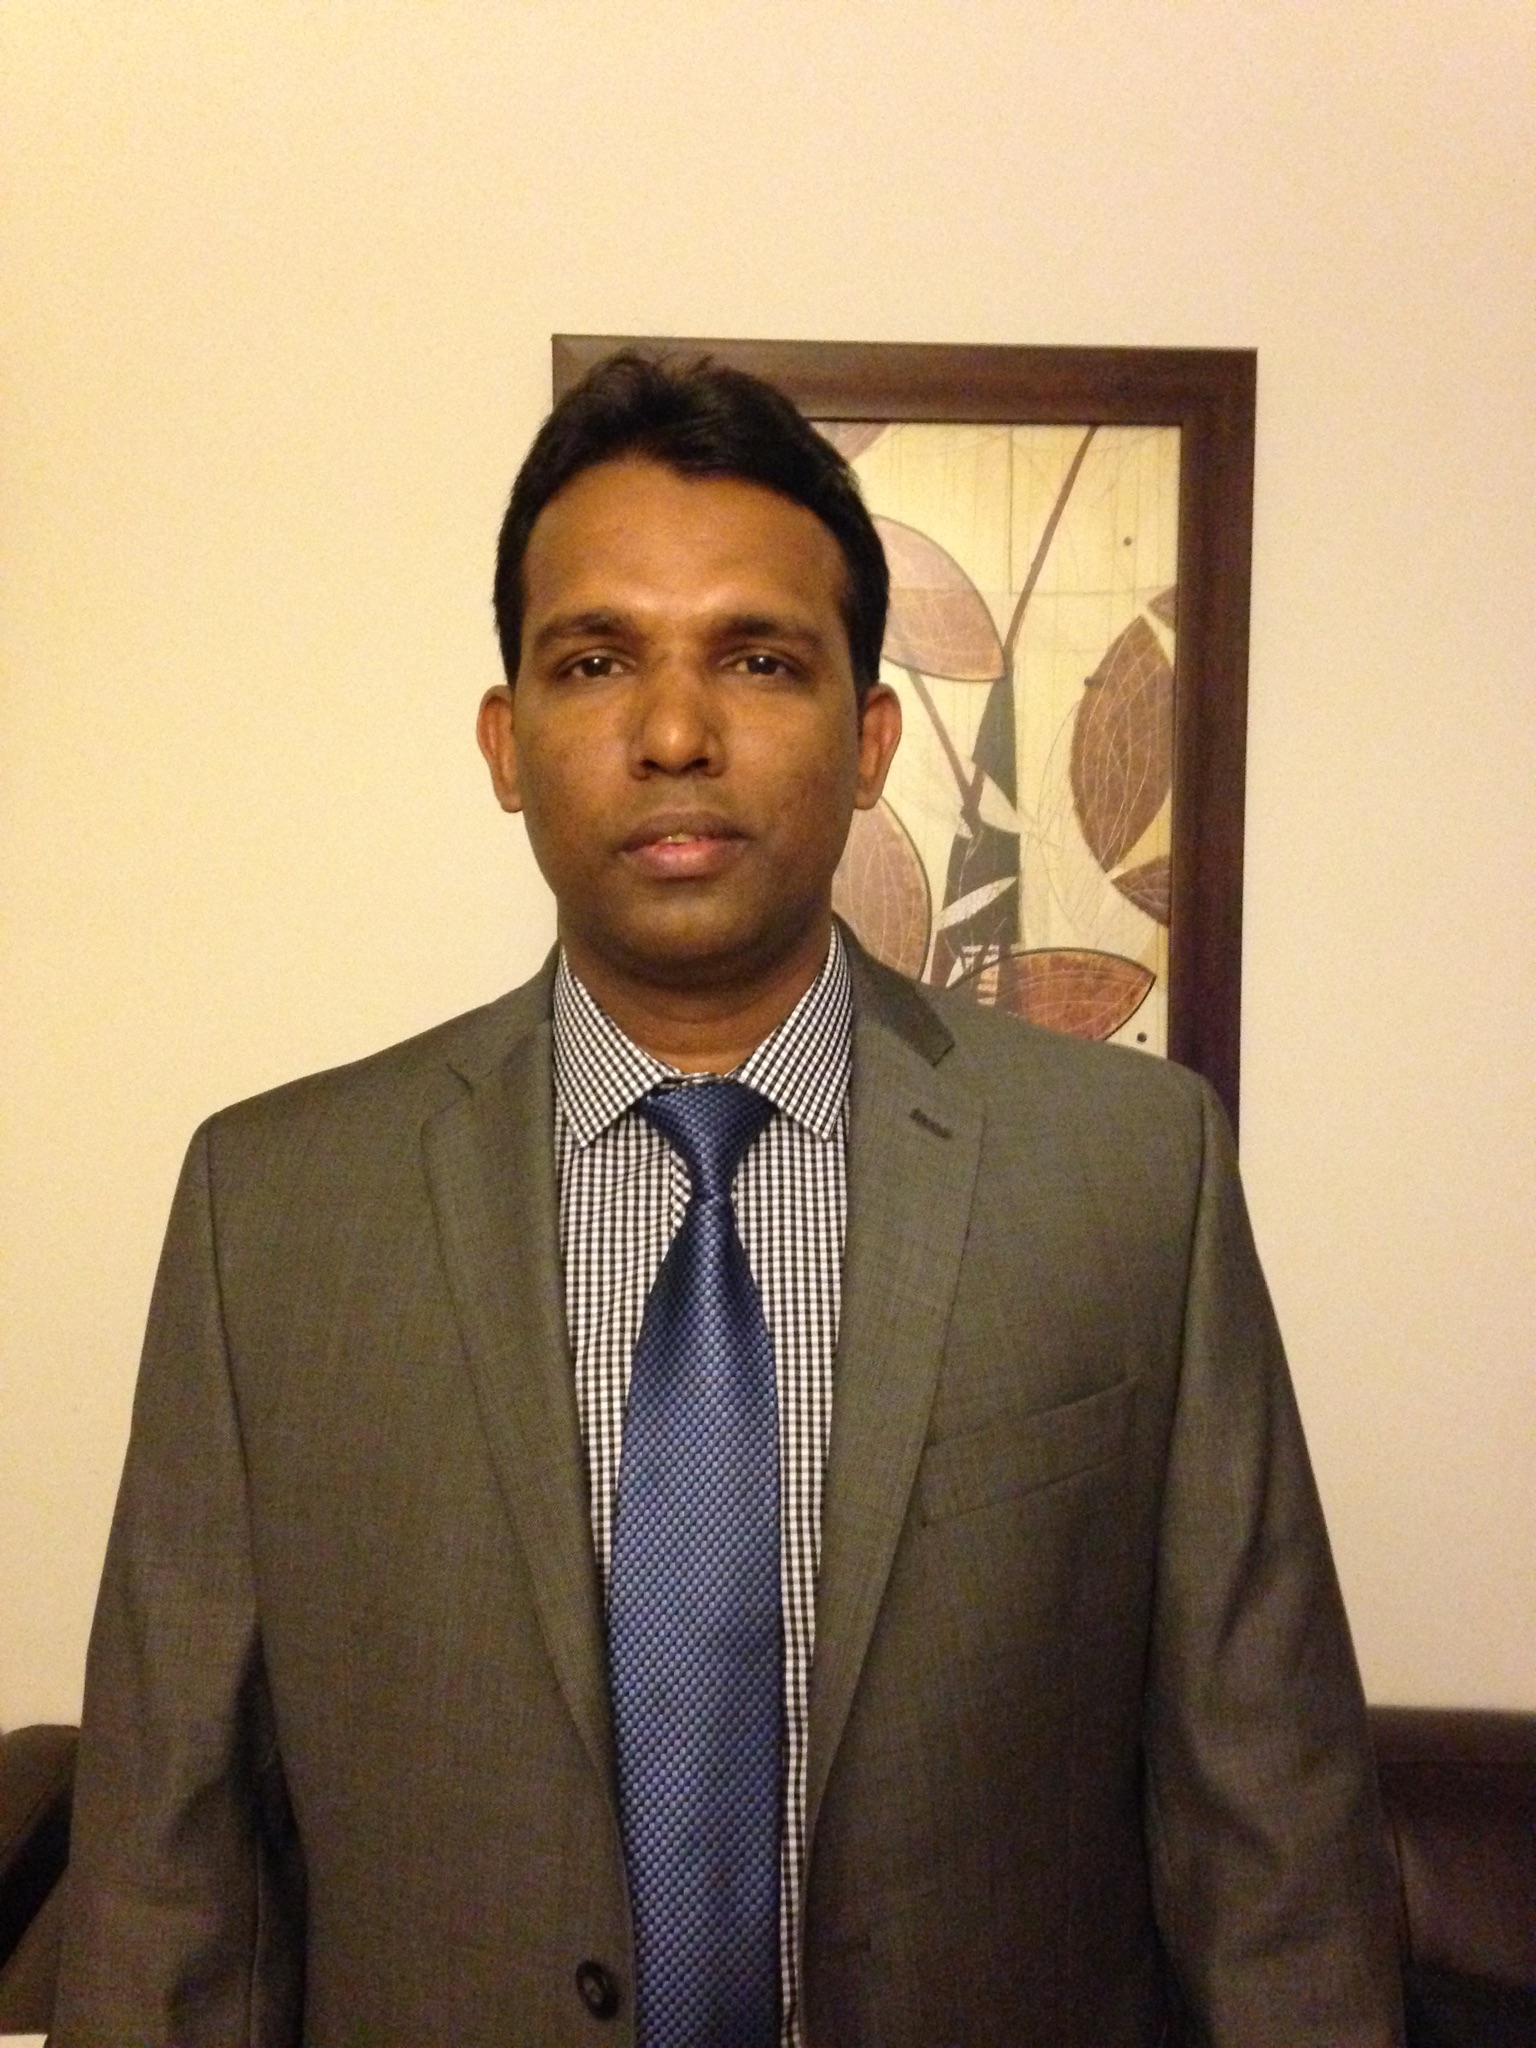 Moshfiqur Rahman